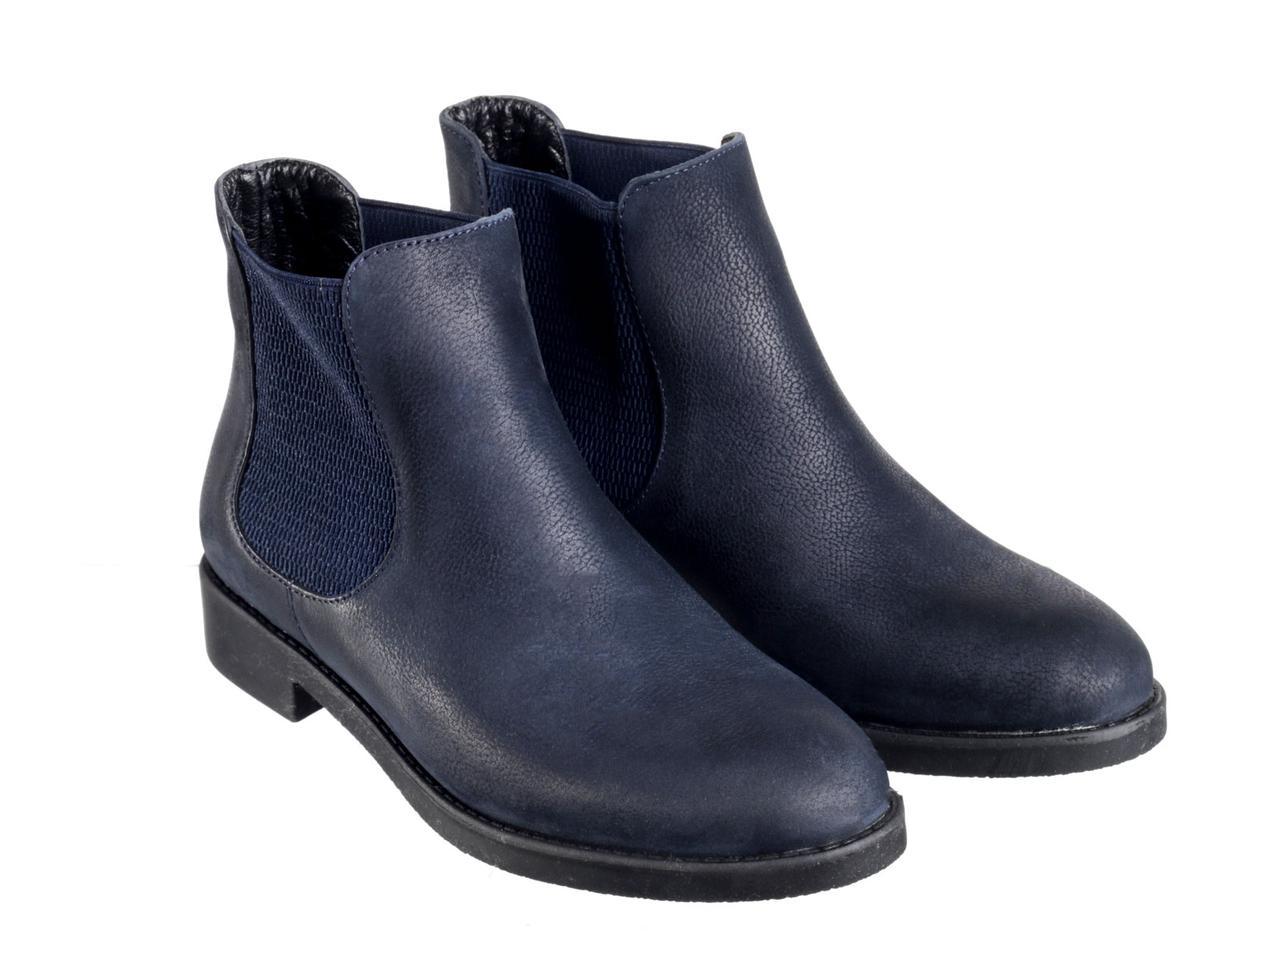 Ботинки Etor 6744-1061-1 синие